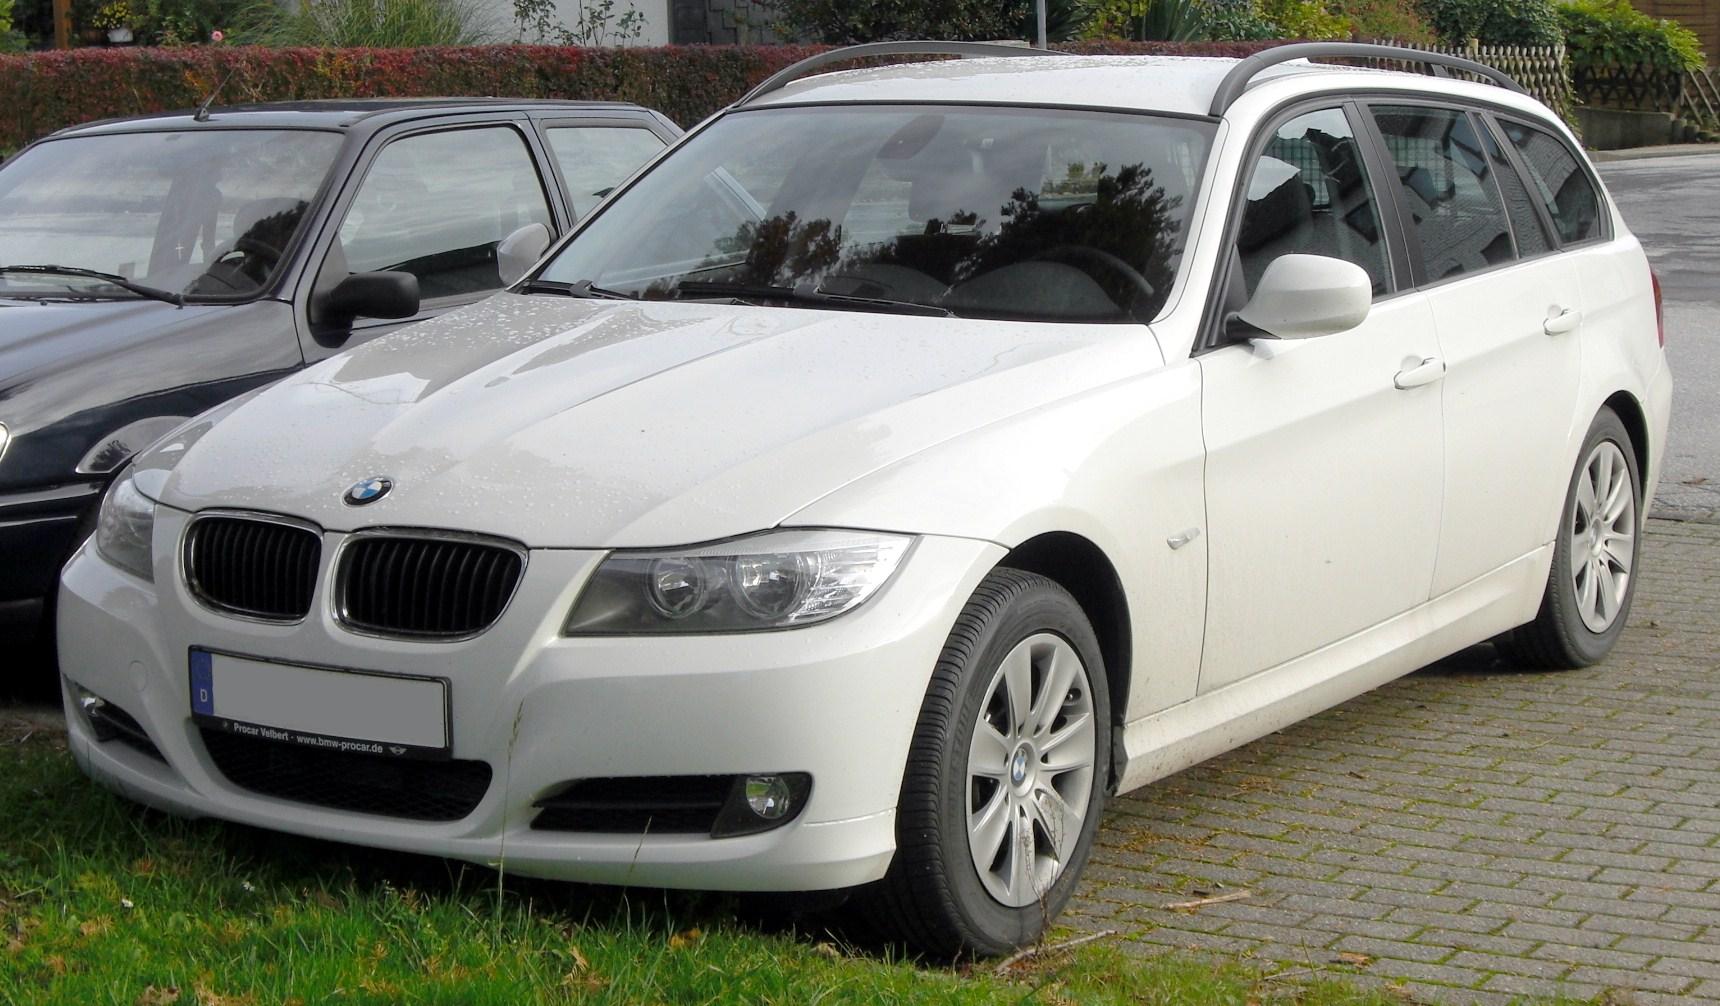 Bmw E90 Wiki >> File:BMW 318i Touring (E91, seit 2008) front MJ.JPG - Wikimedia Commons